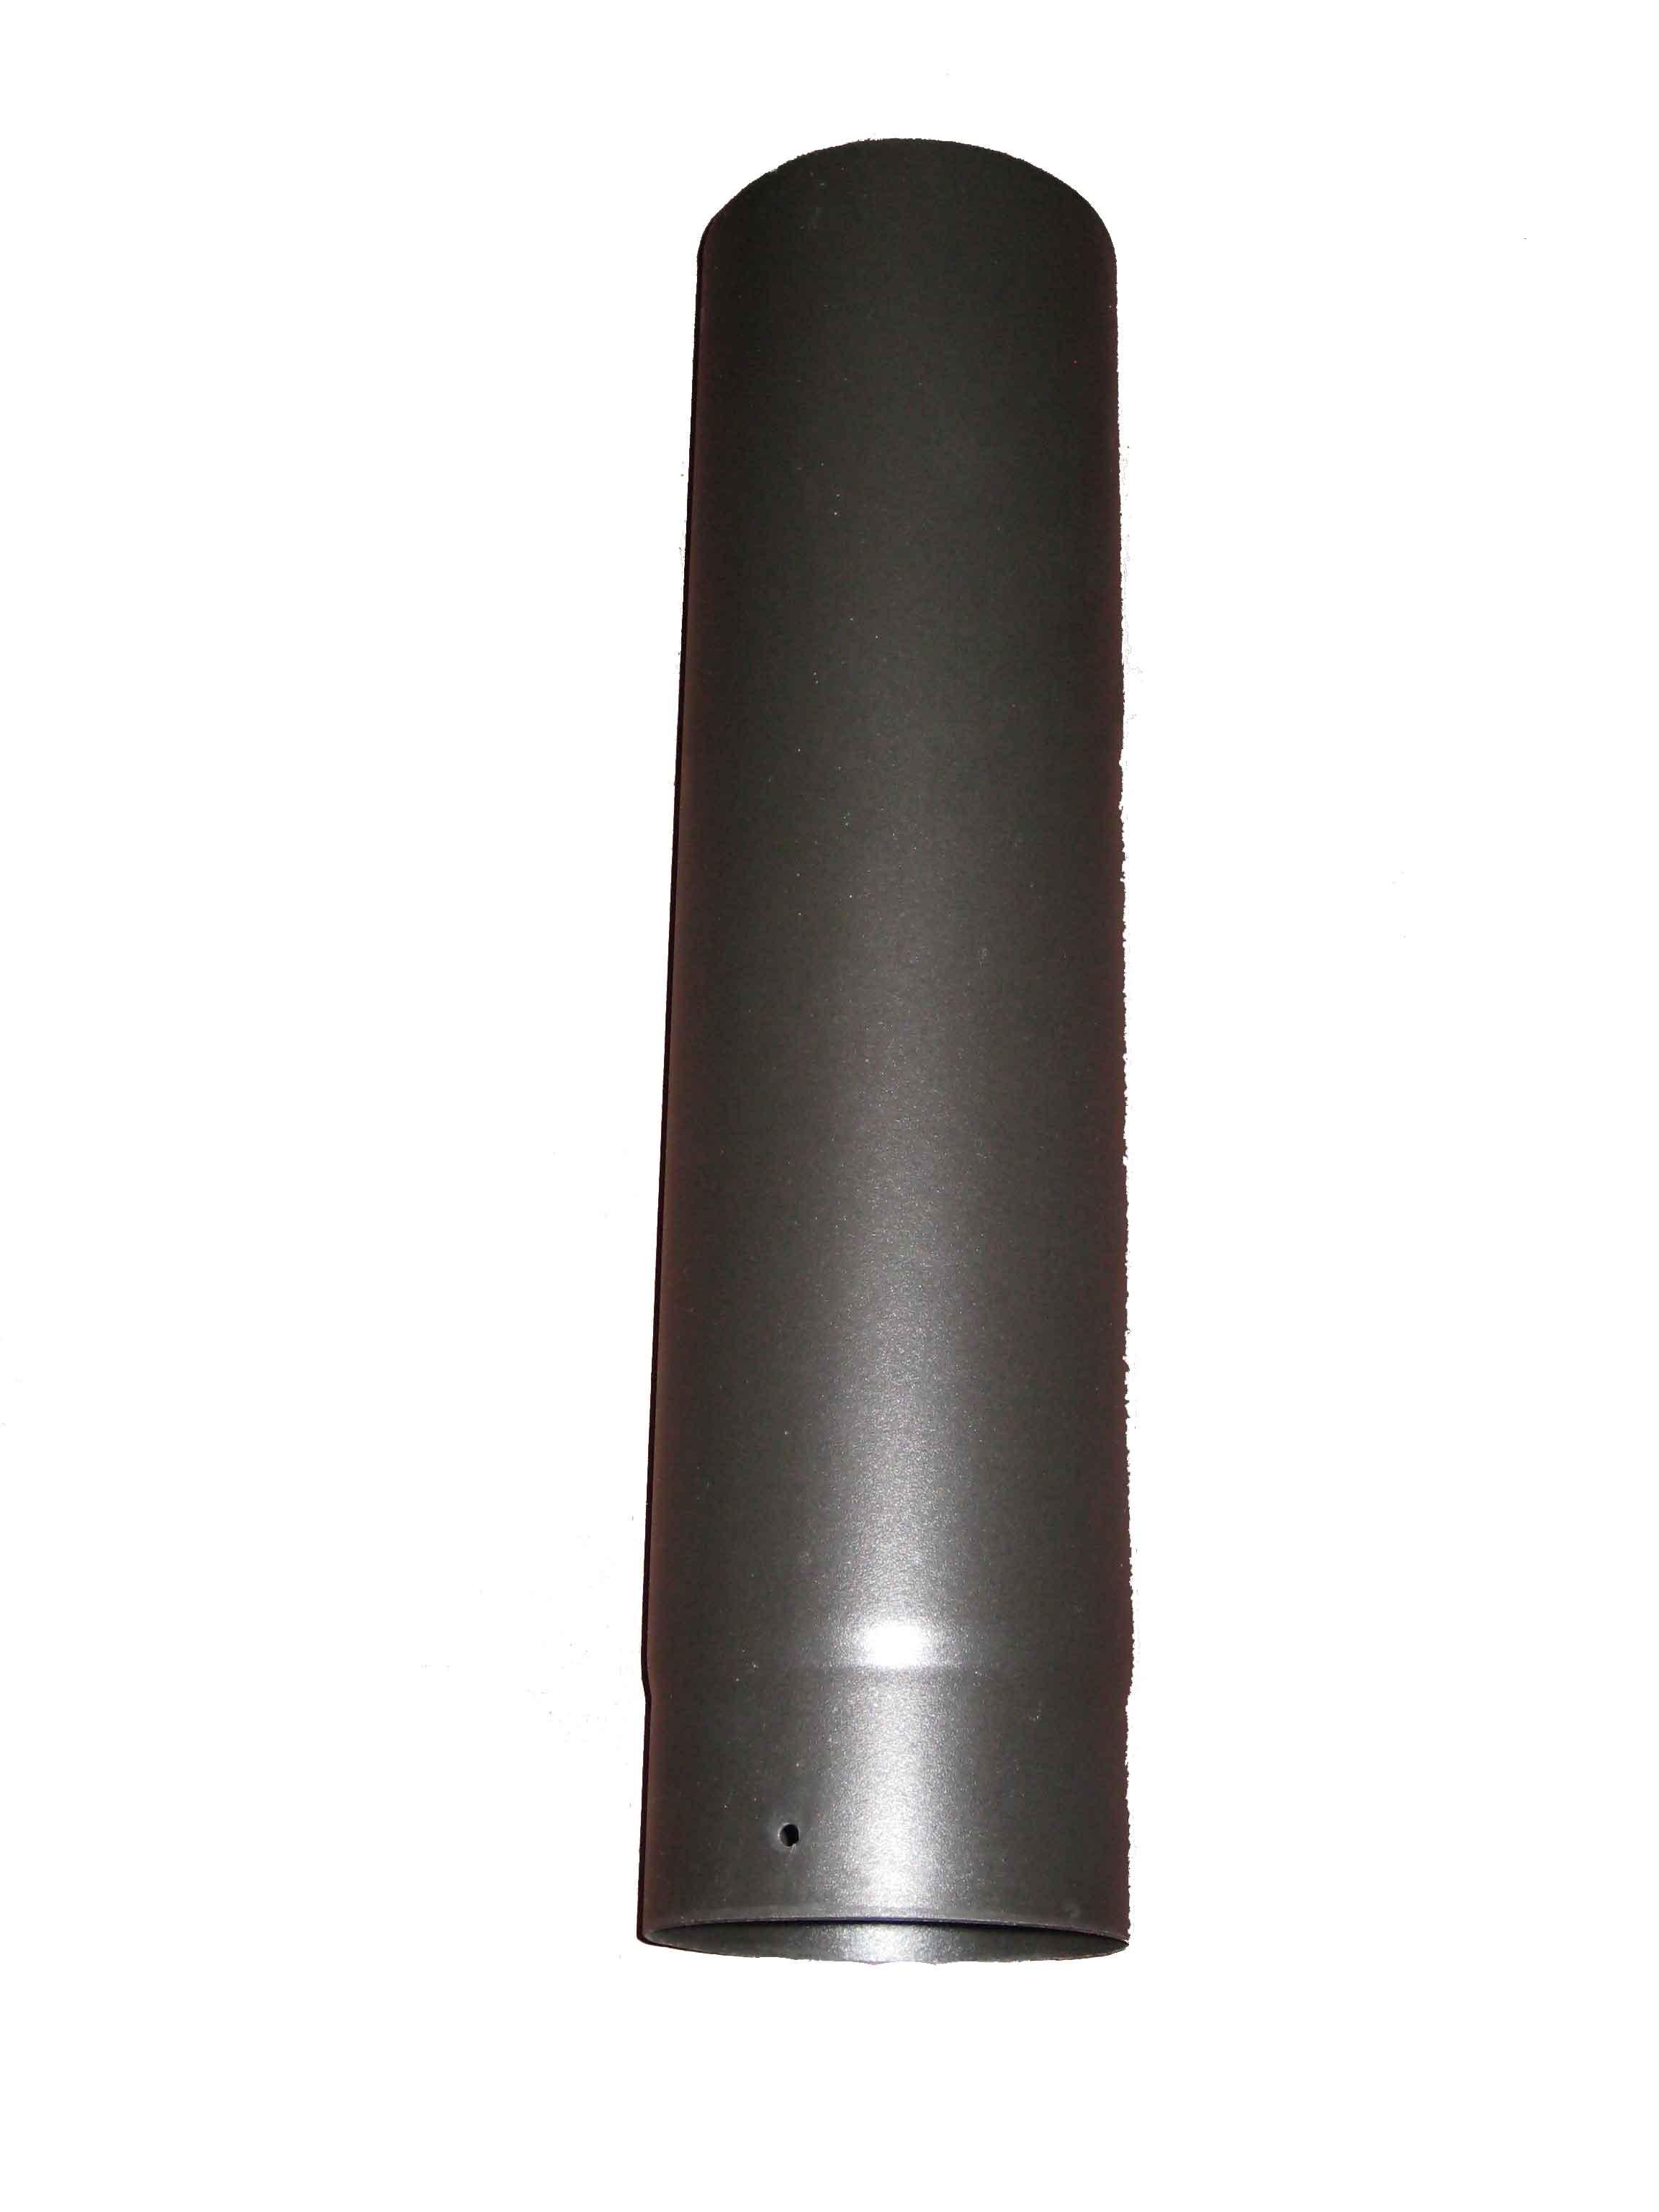 "Matt Black Enamel 1000mm Straight MBE Pipe 6"""